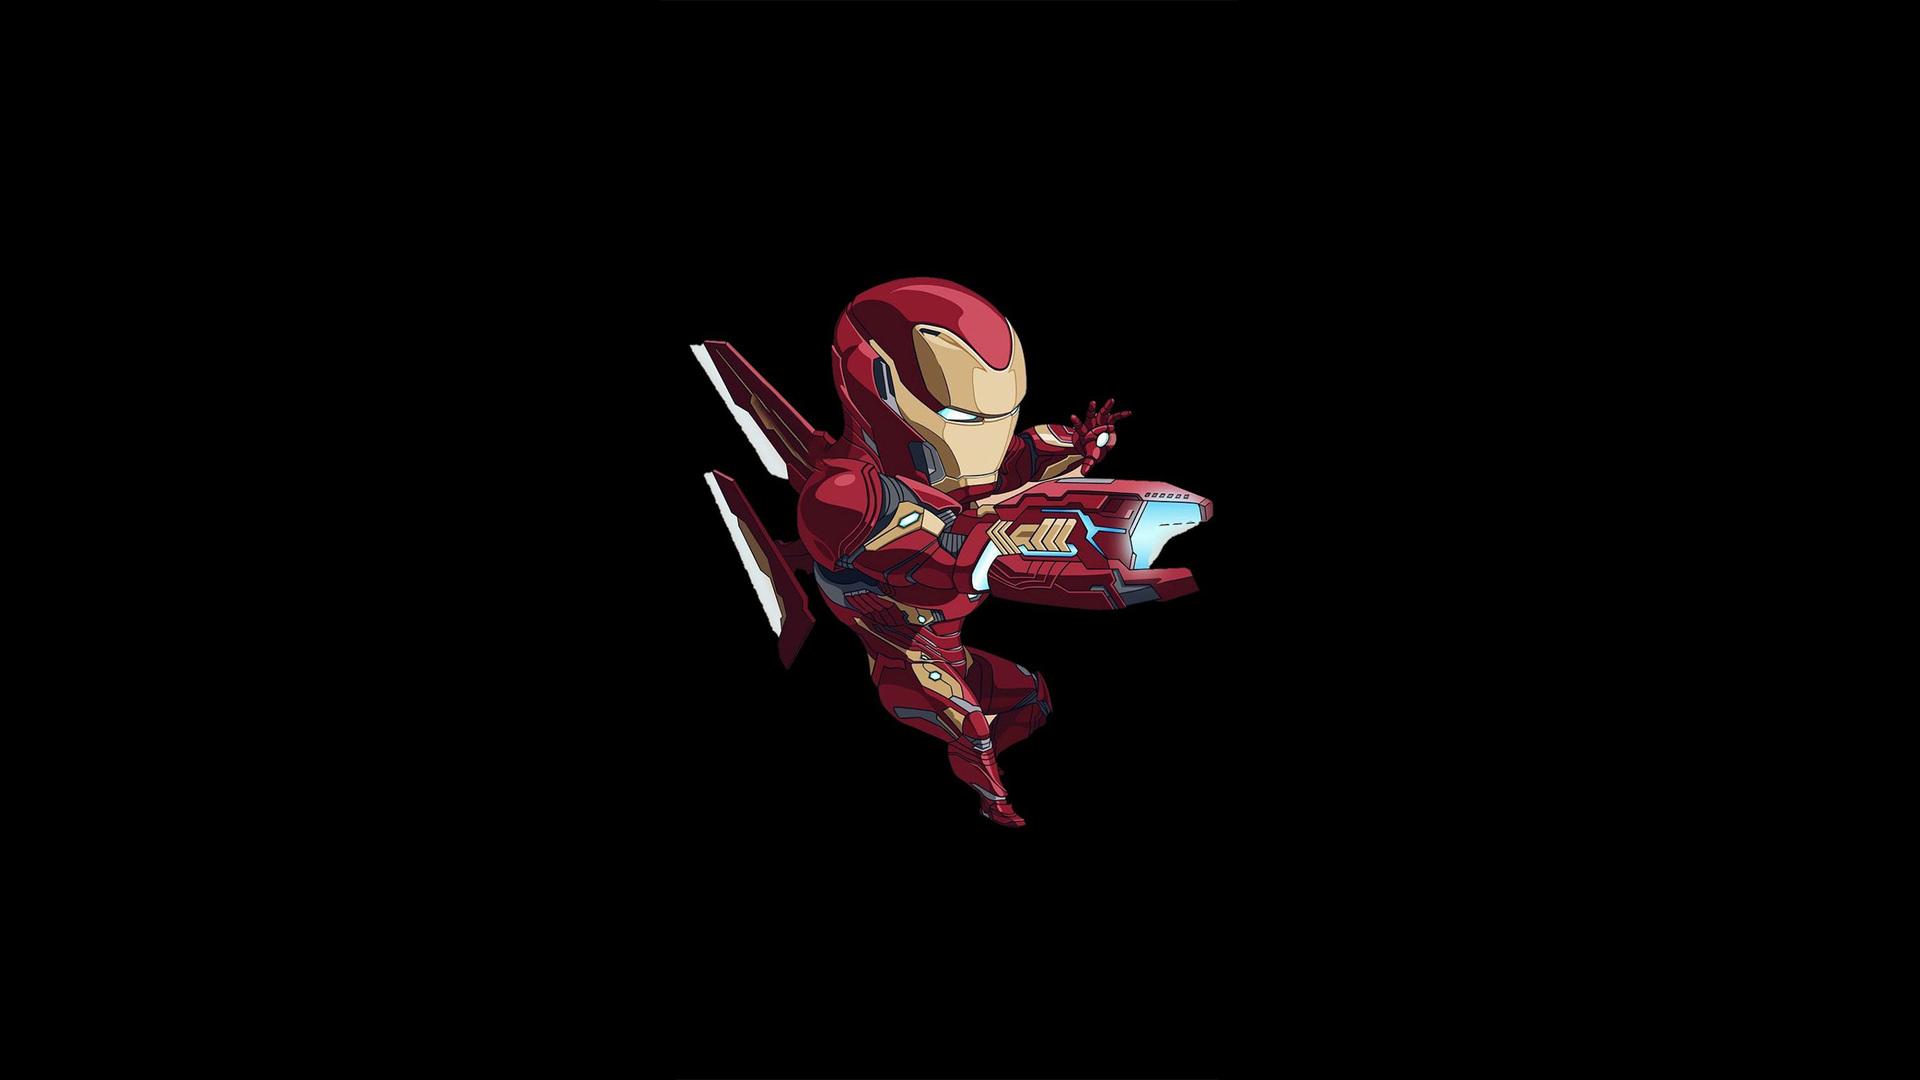 1920x1080 Iron Man Bleeding Edge Armor Artwork Laptop Full Hd 1080p